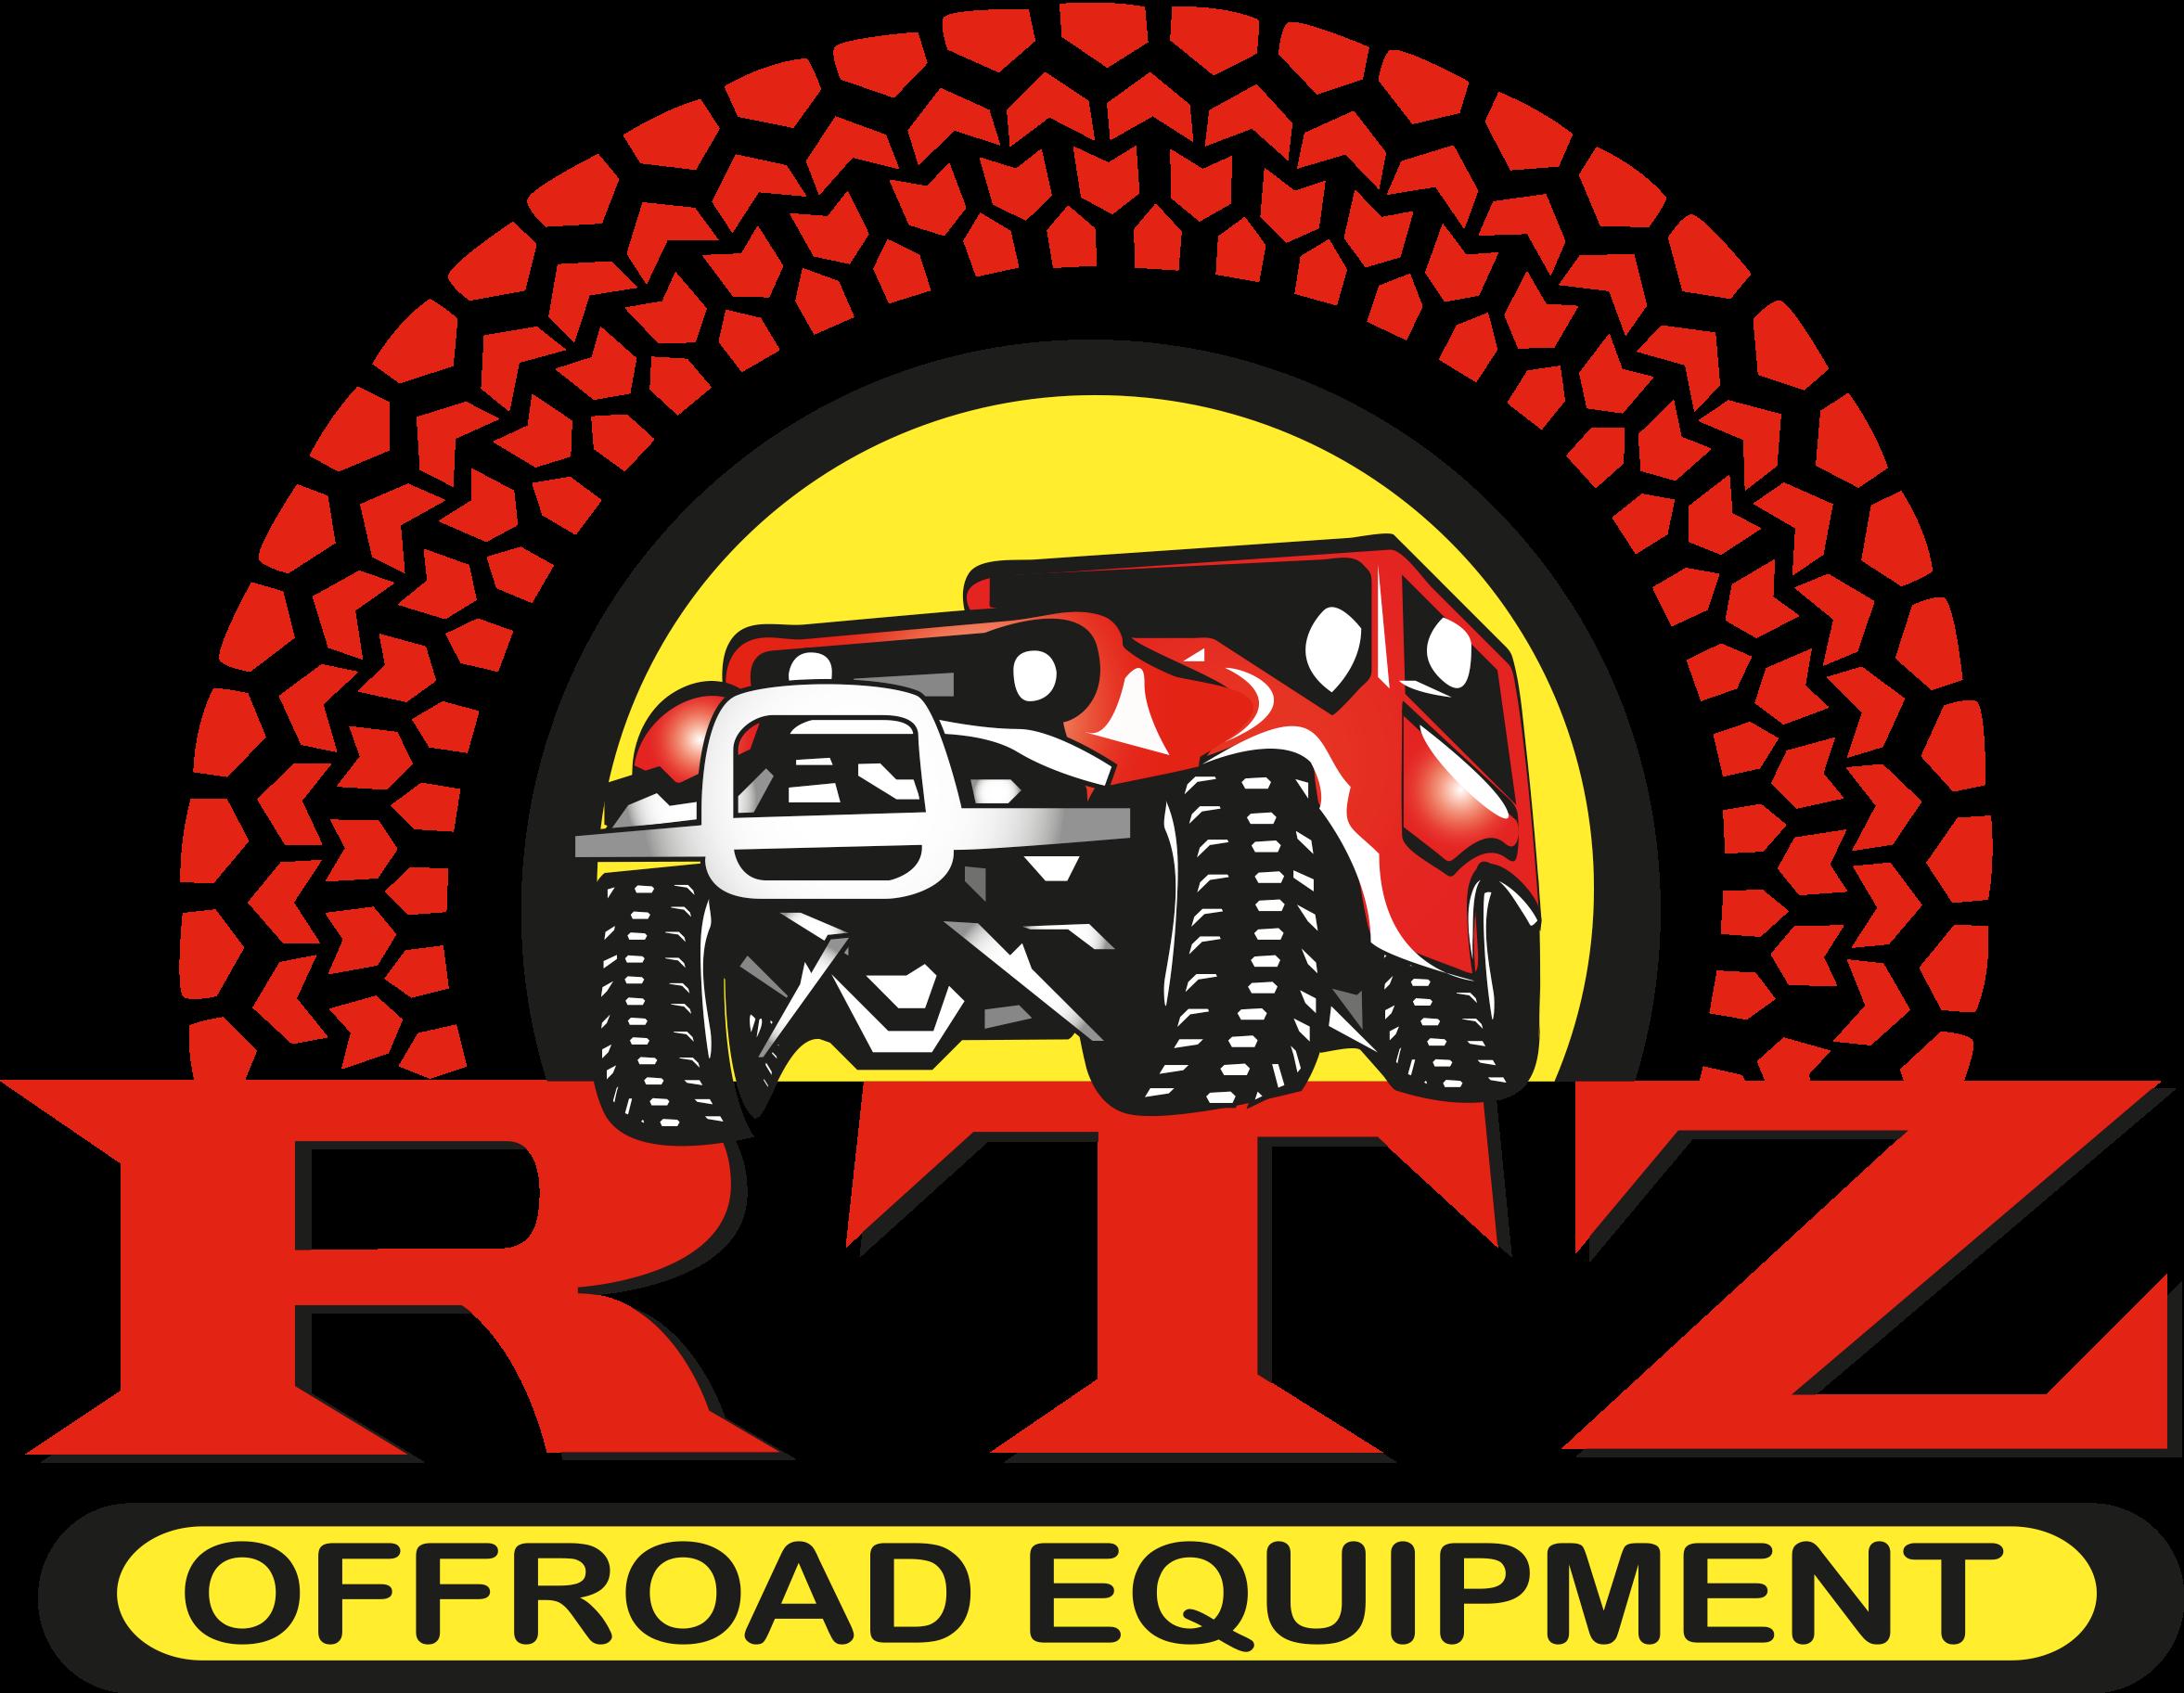 RTZ Offroad